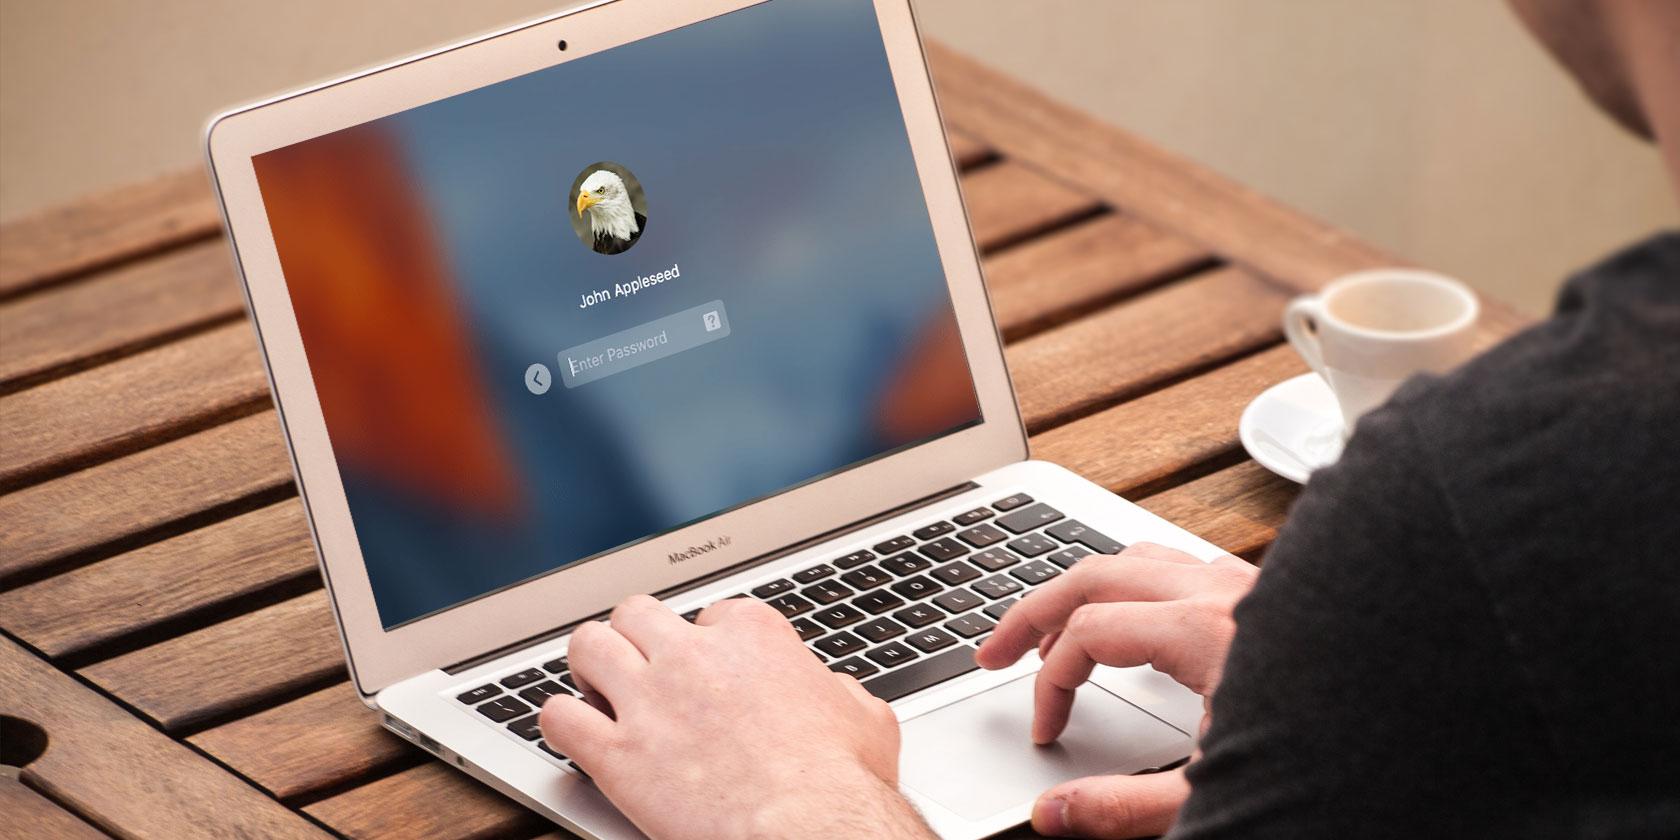 customize-login-screen-mac